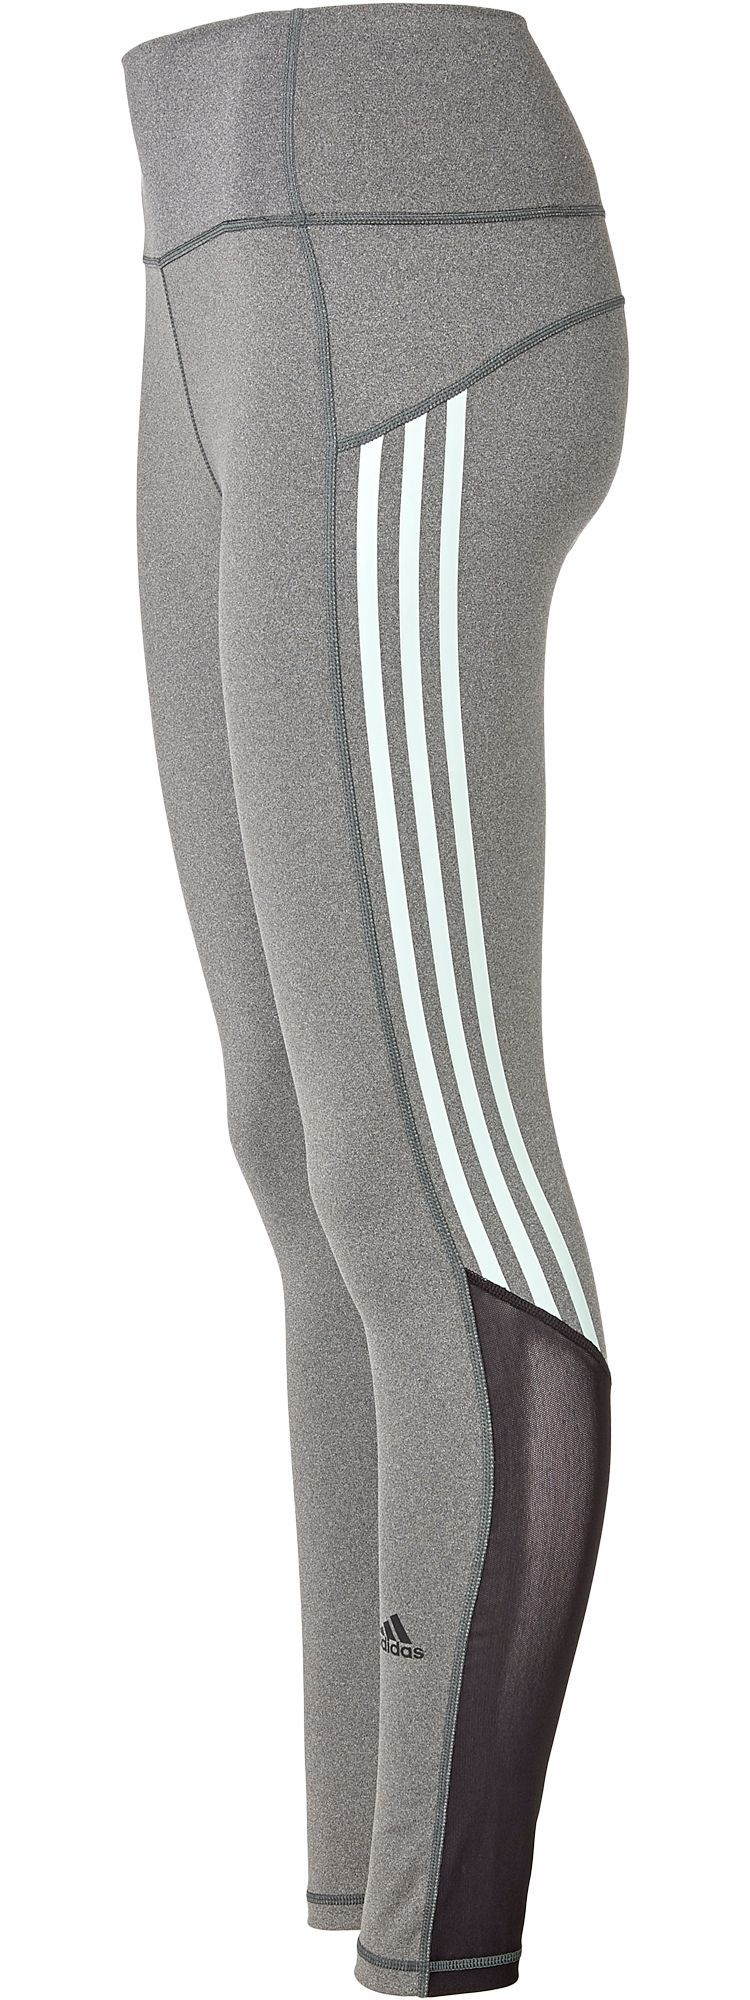 0da5eb23edb adidas Women's Believe This 3-Stripe 7/8 Training Tights, Size: Small,  Dgh/Ash Green